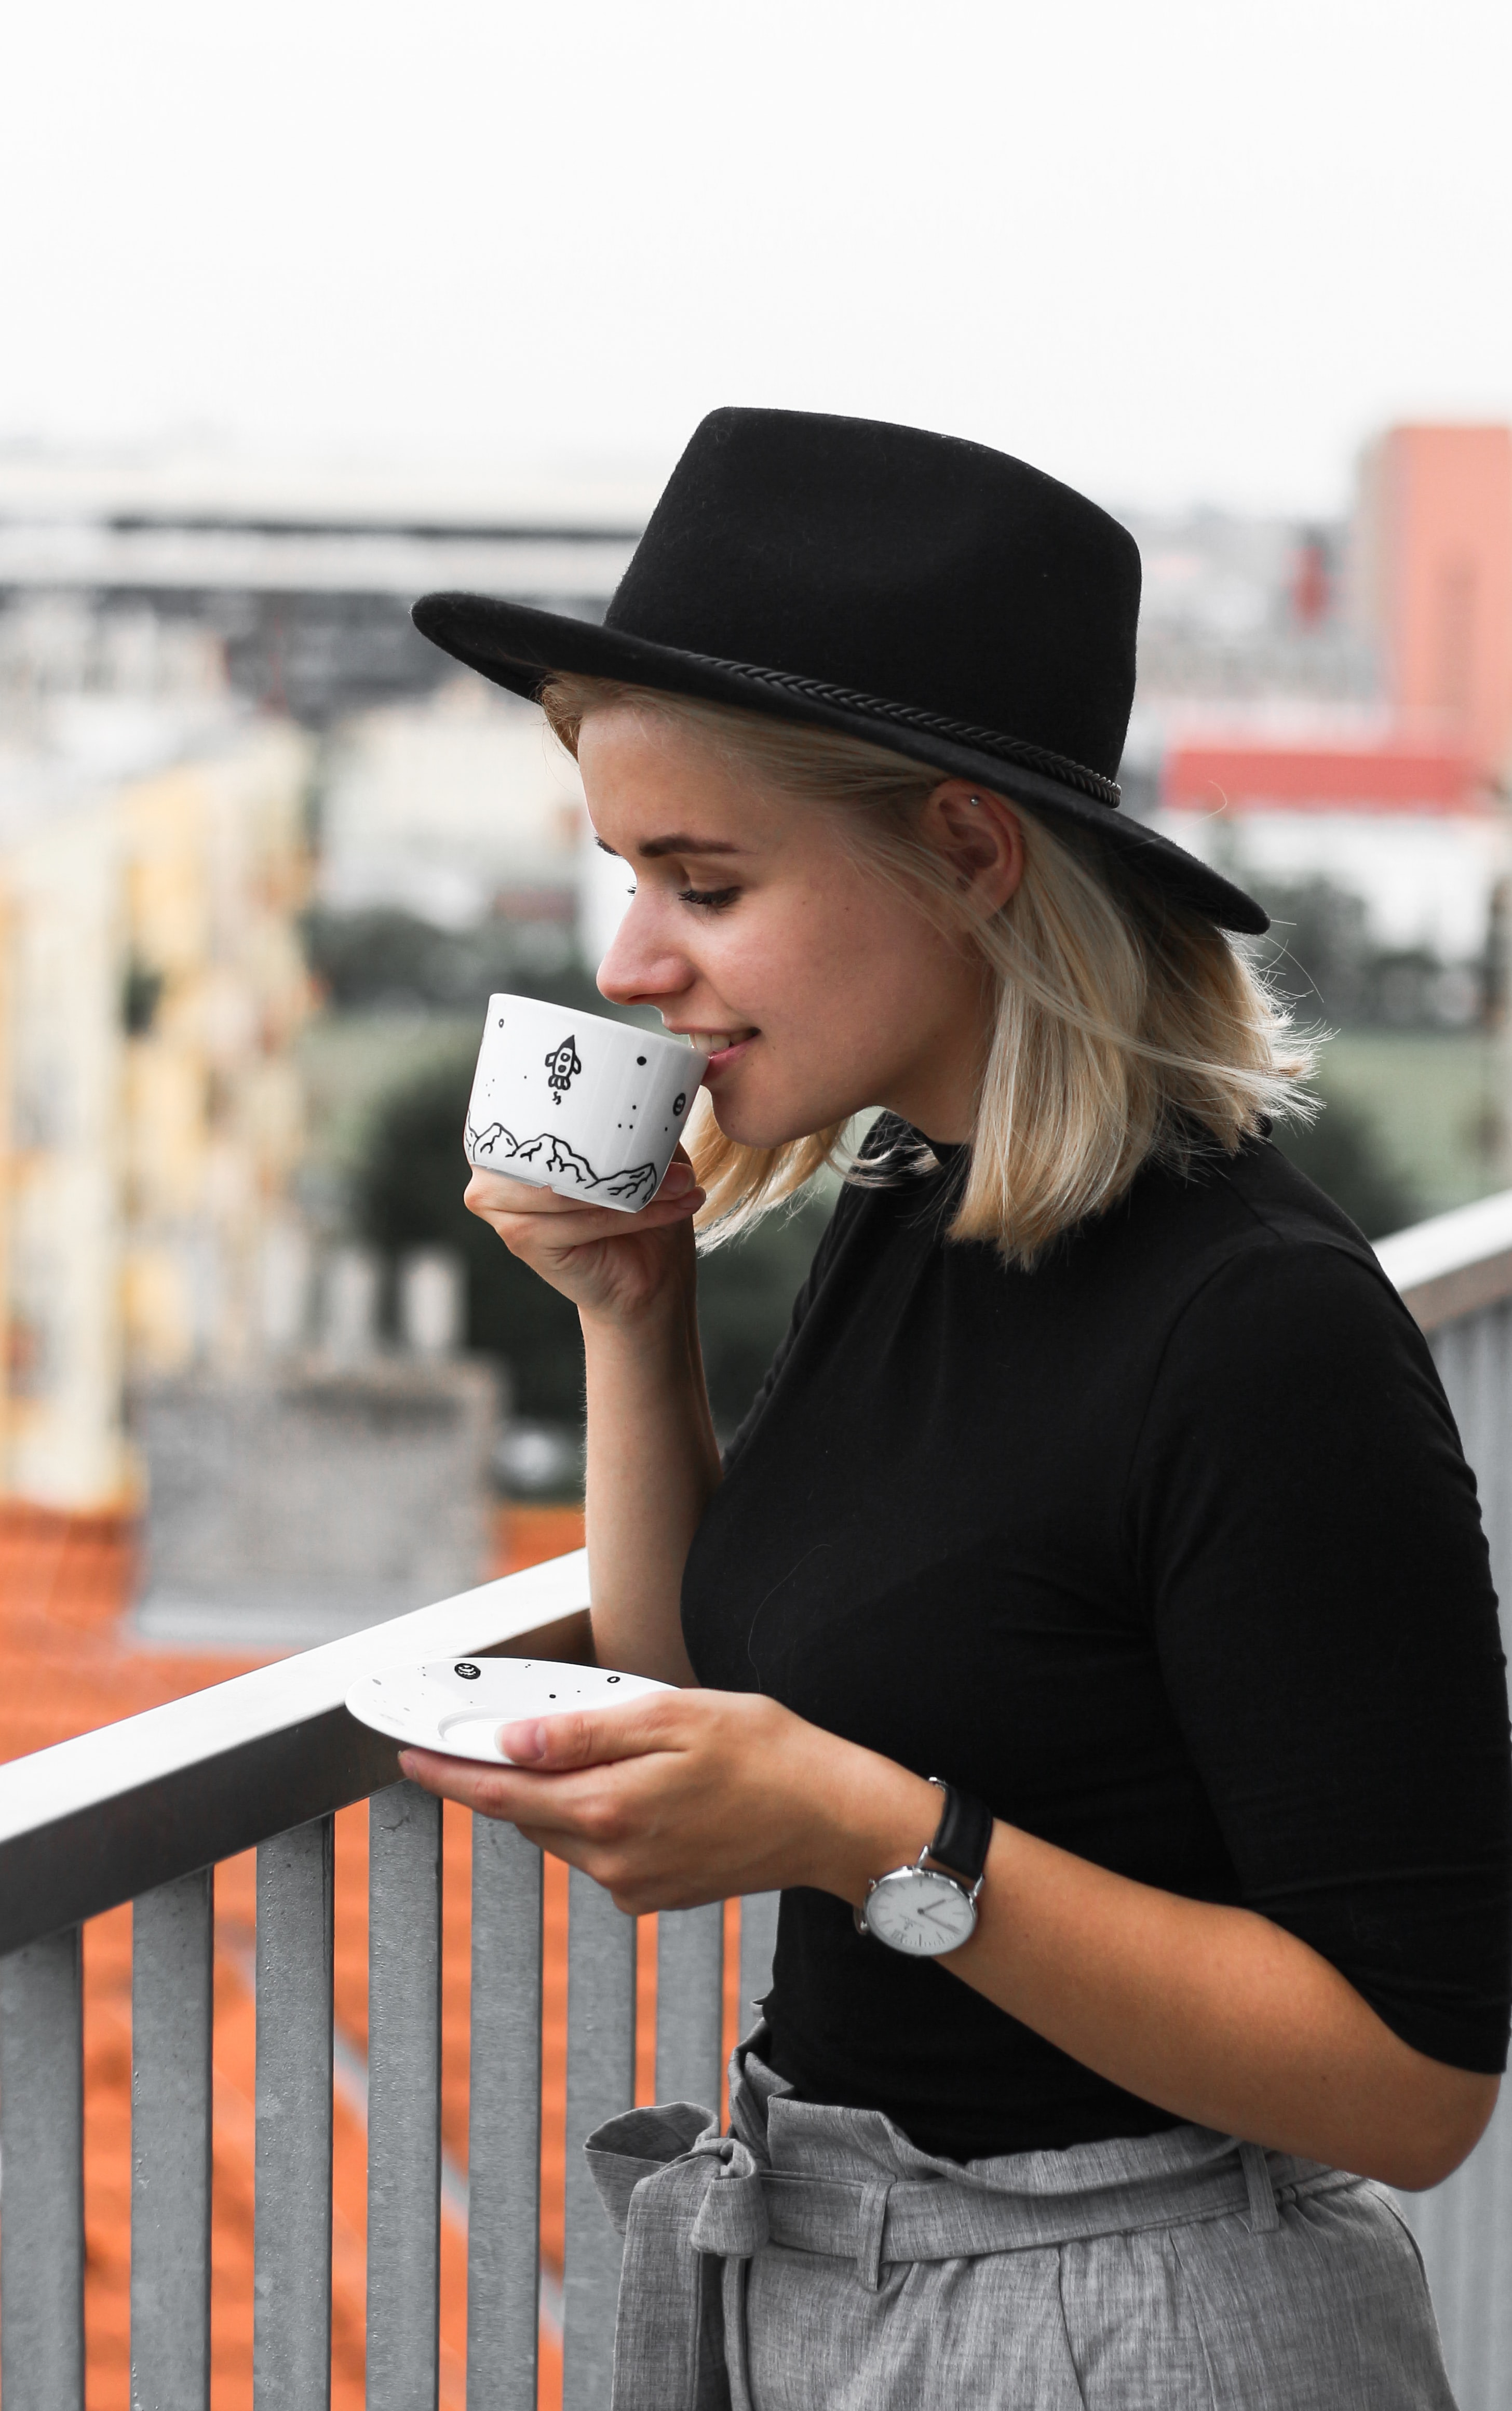 woman drinking on cup of coffee near railings